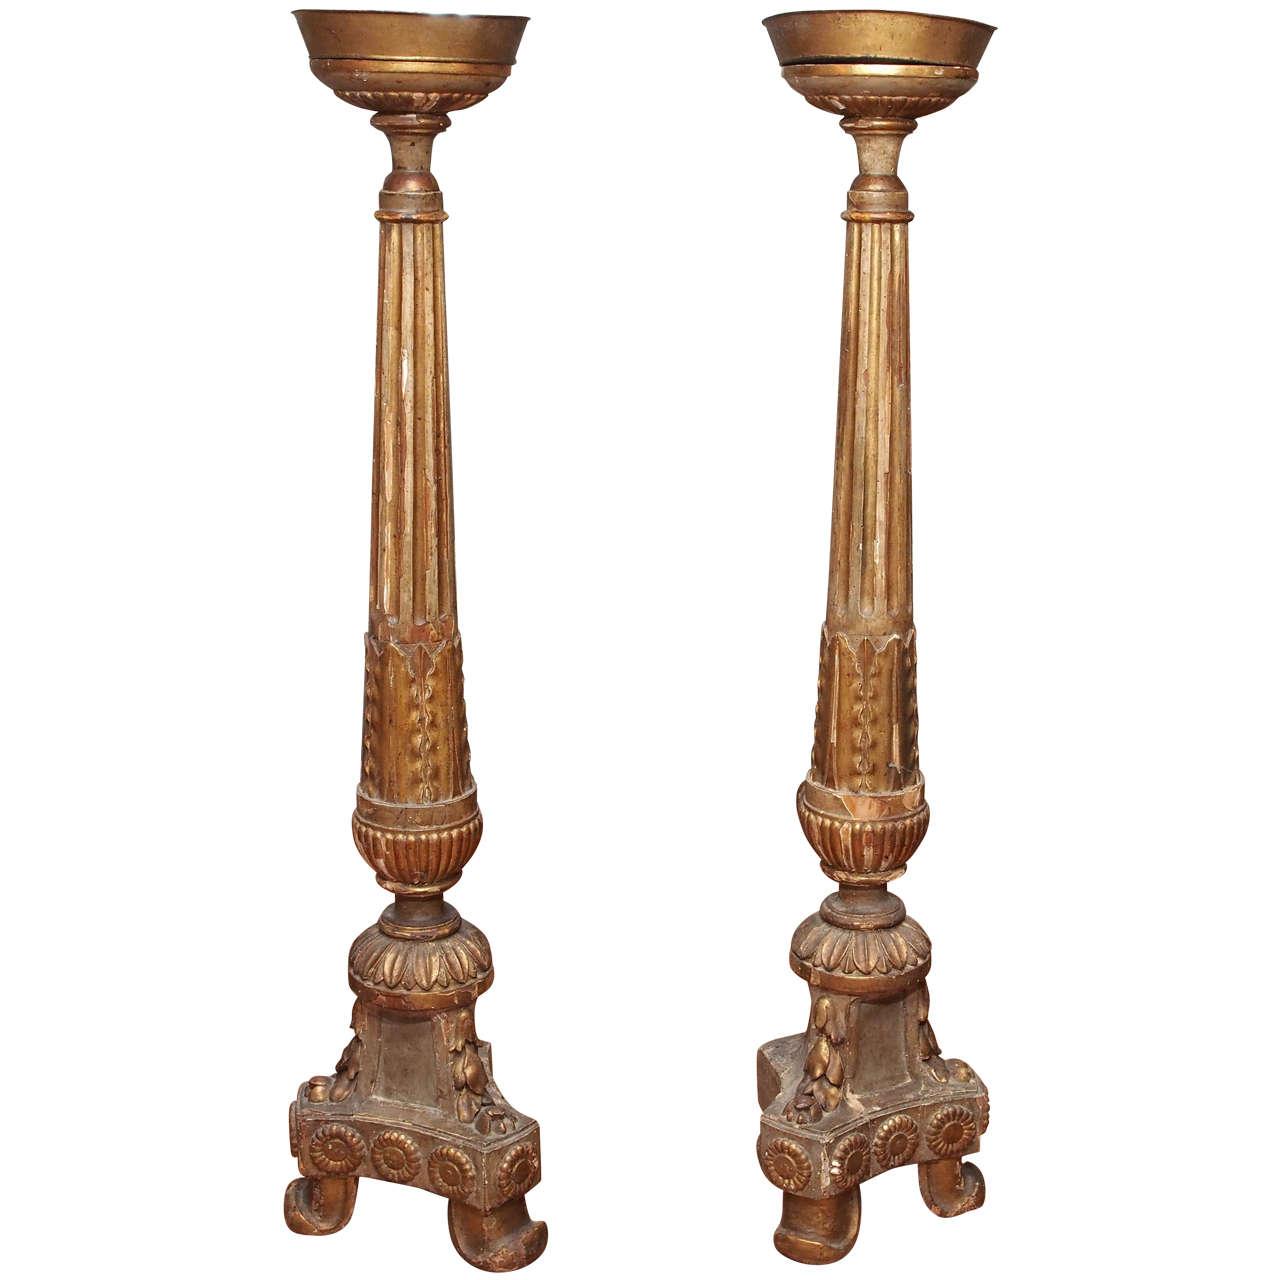 Pair Of 19th Century Floor Altar Sticks At 1stdibs